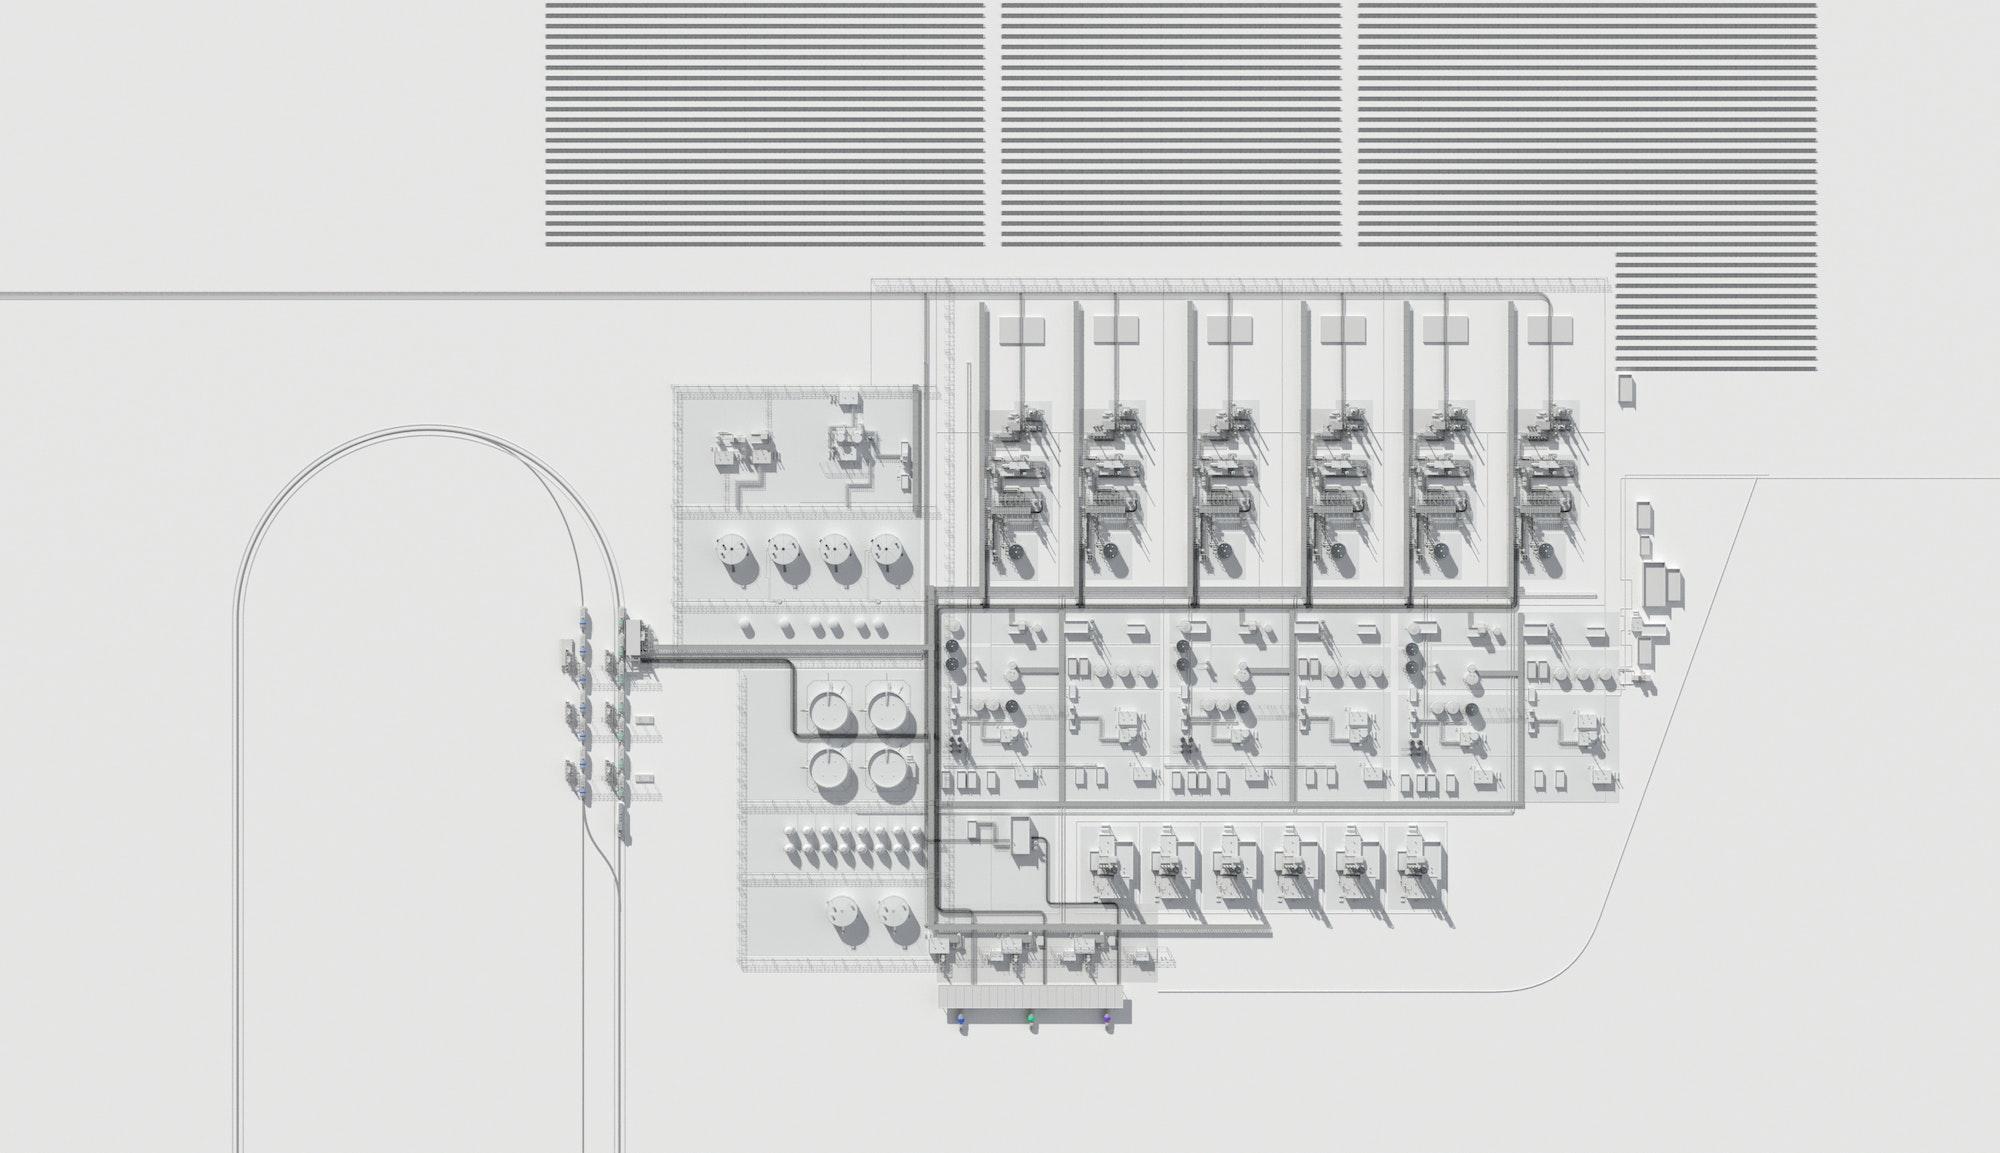 Facility elements